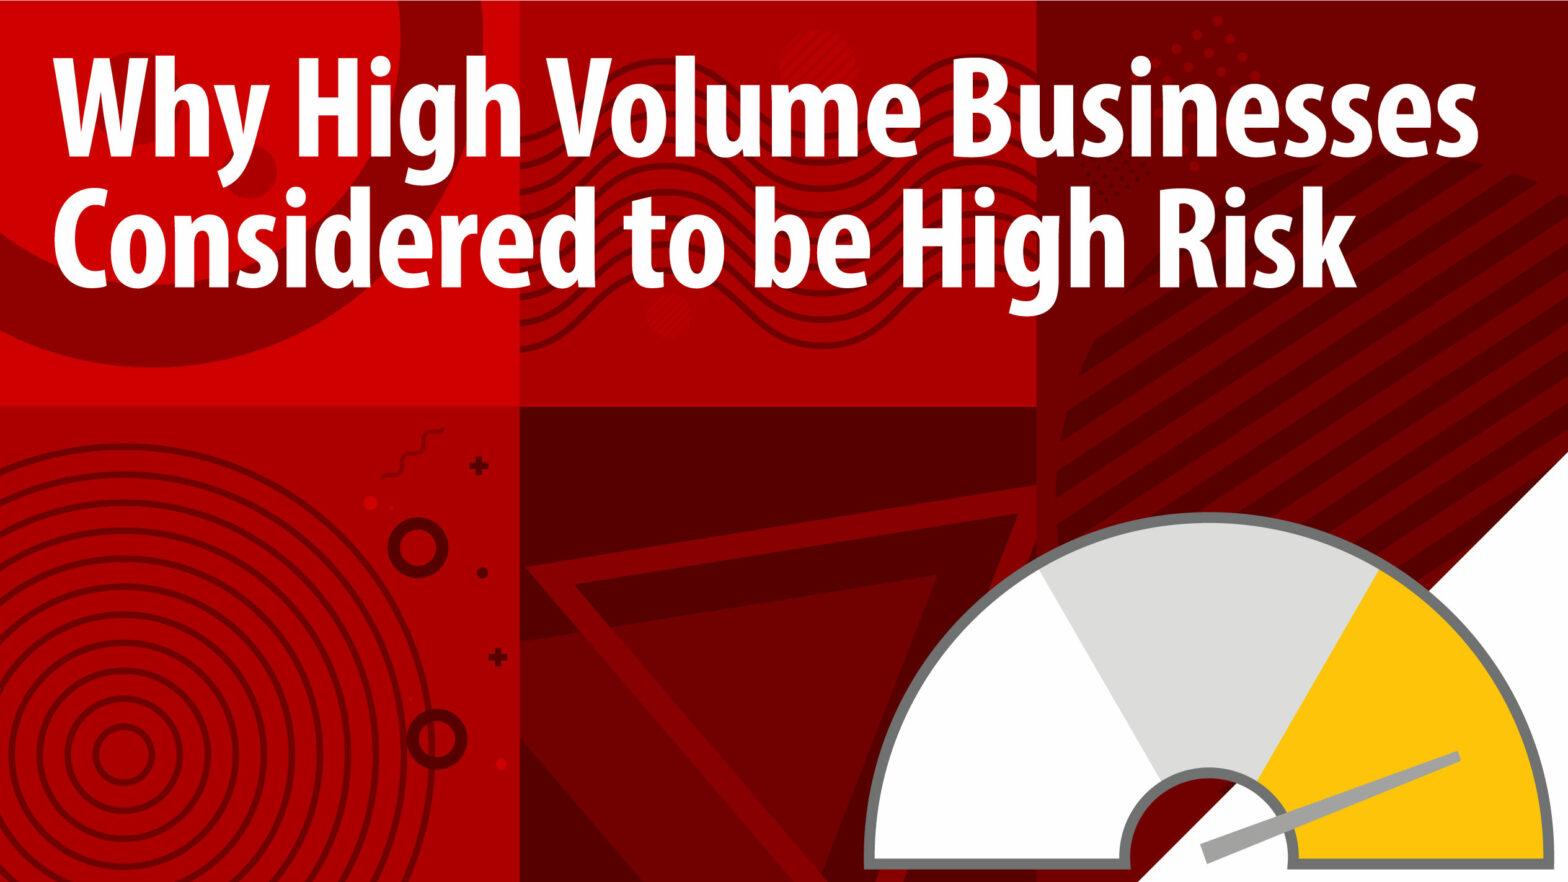 High Volume is High Risk Article Header